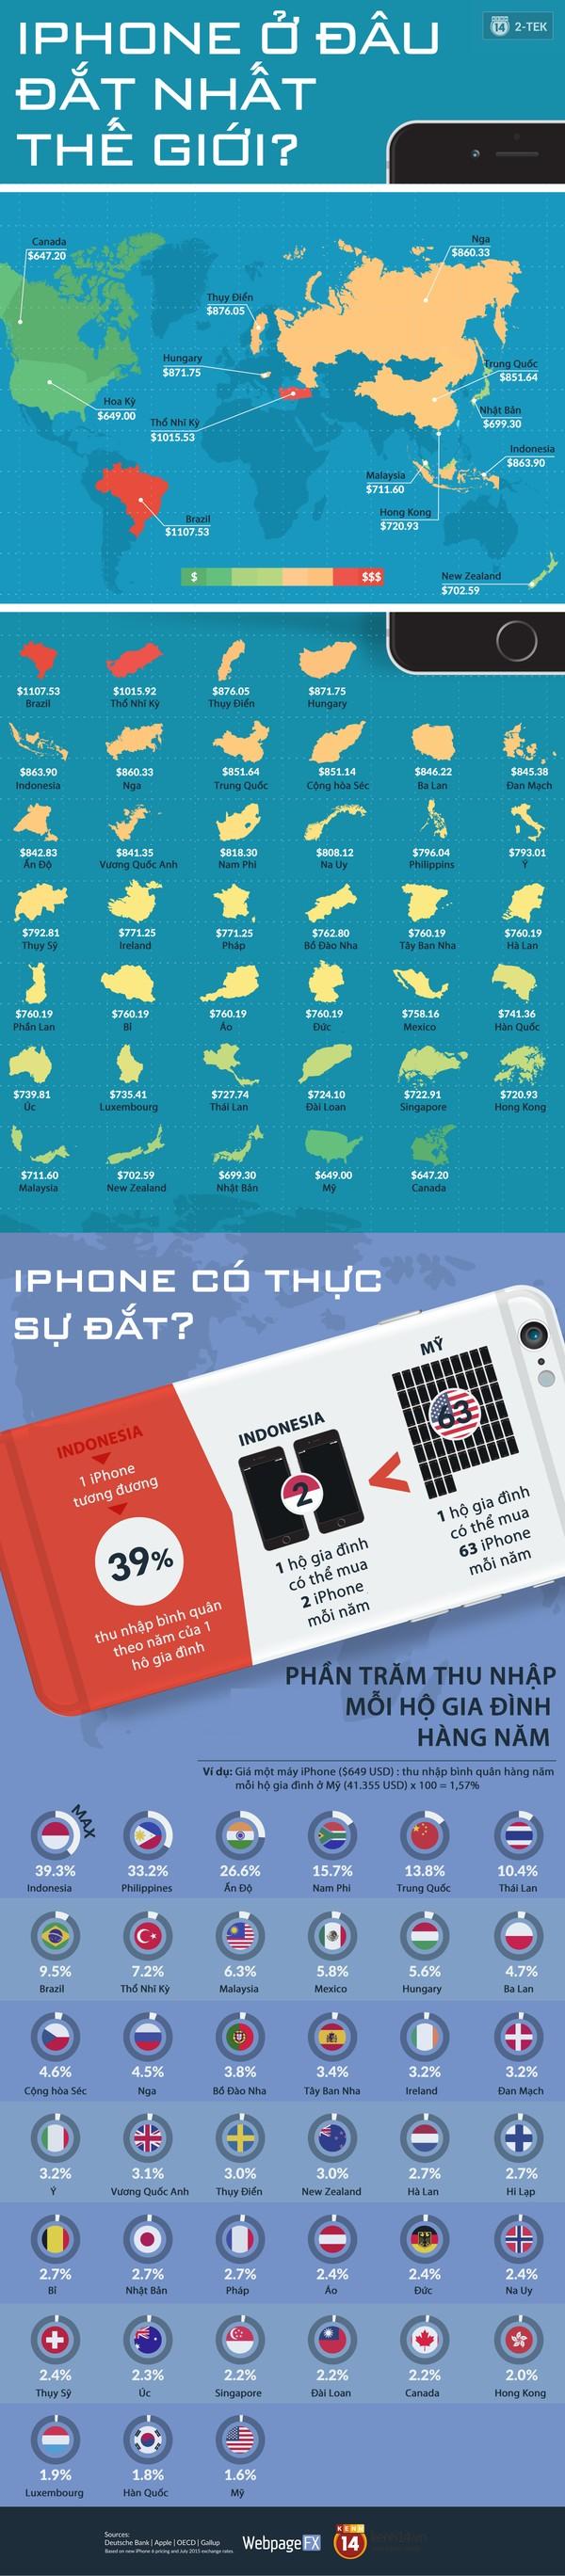 cost-of-iphone-around-world5-117fb